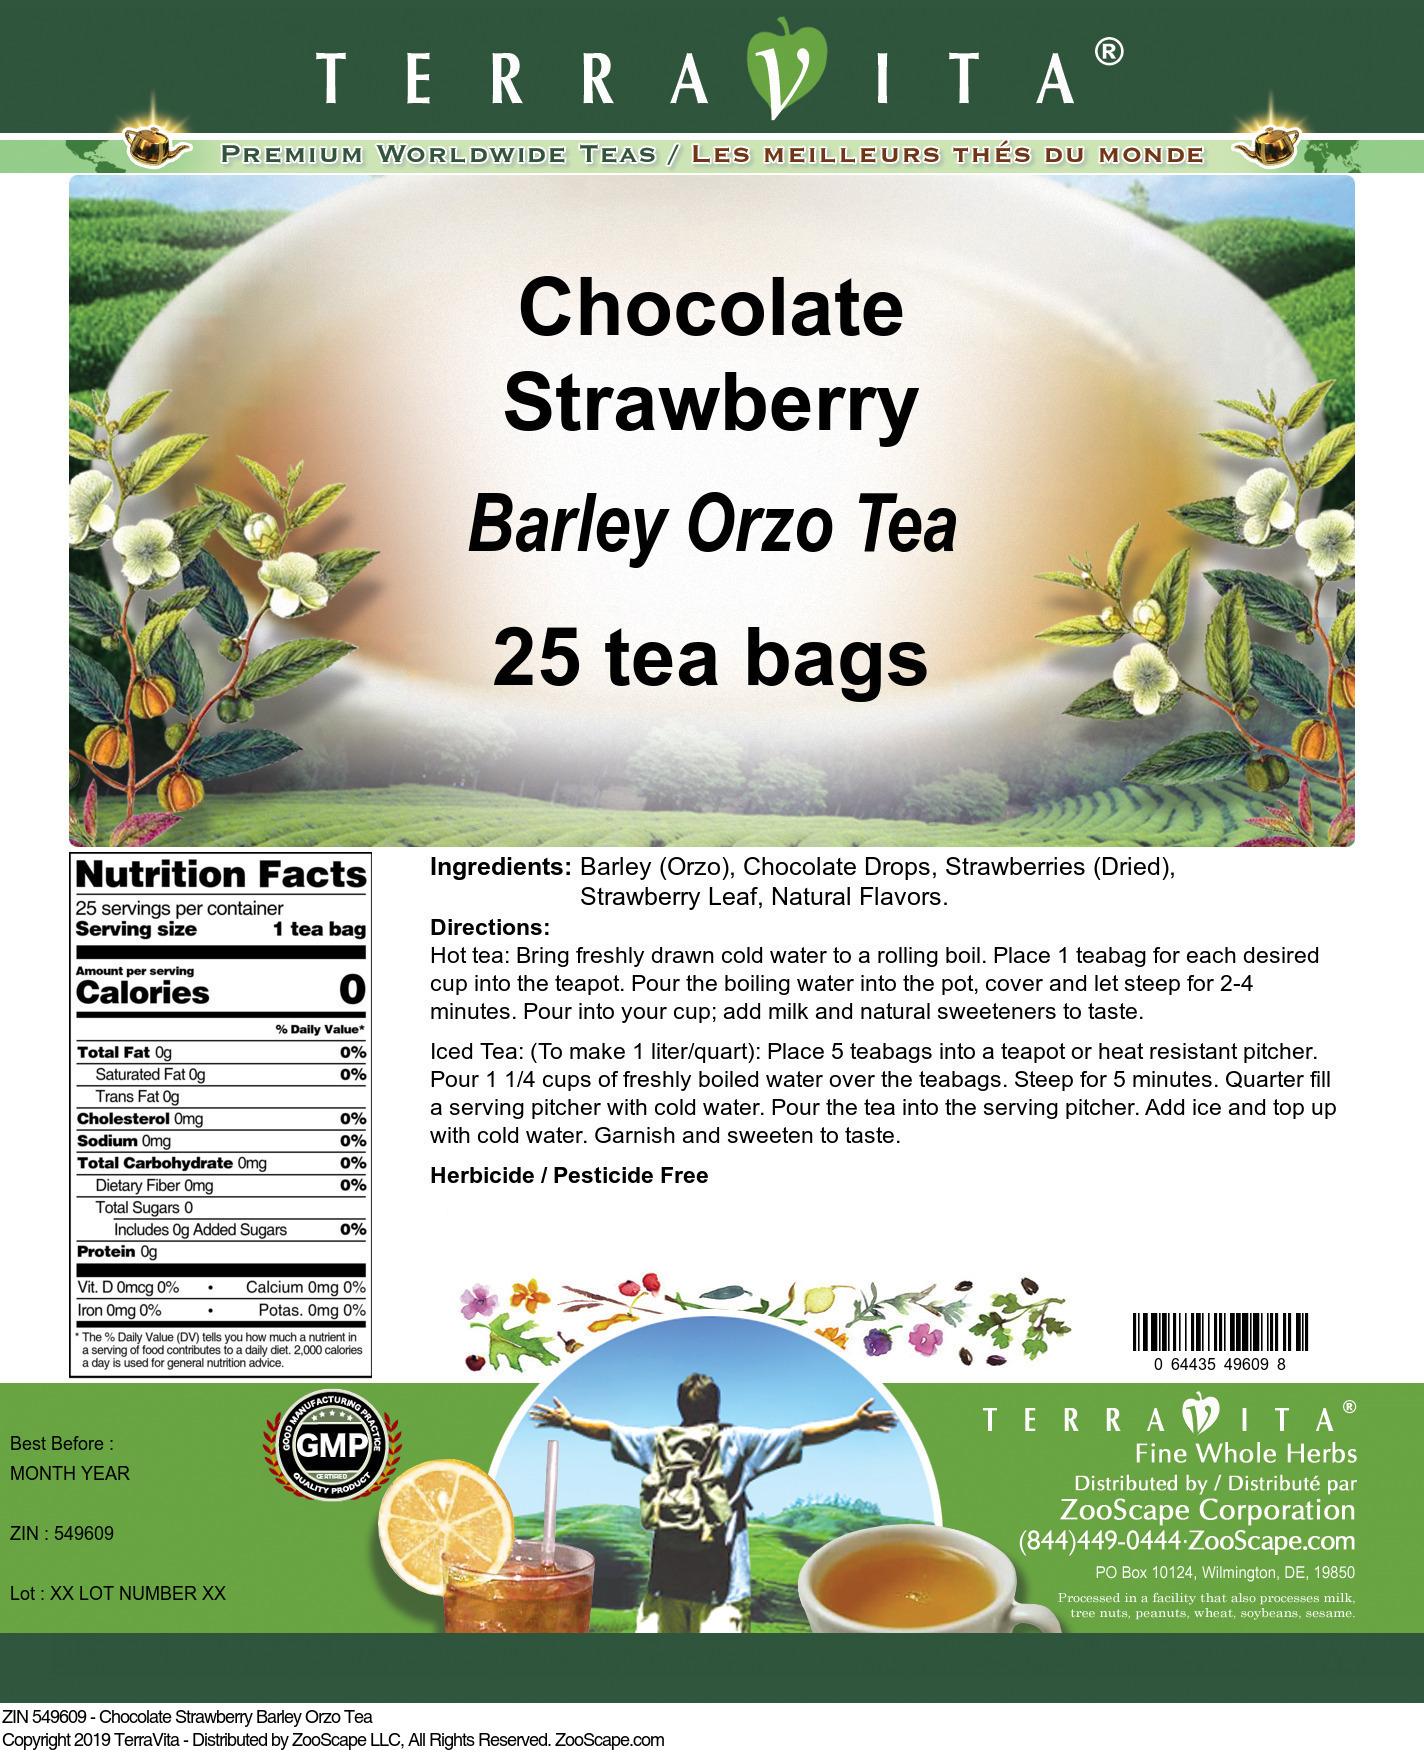 Chocolate Strawberry Barley Orzo Tea